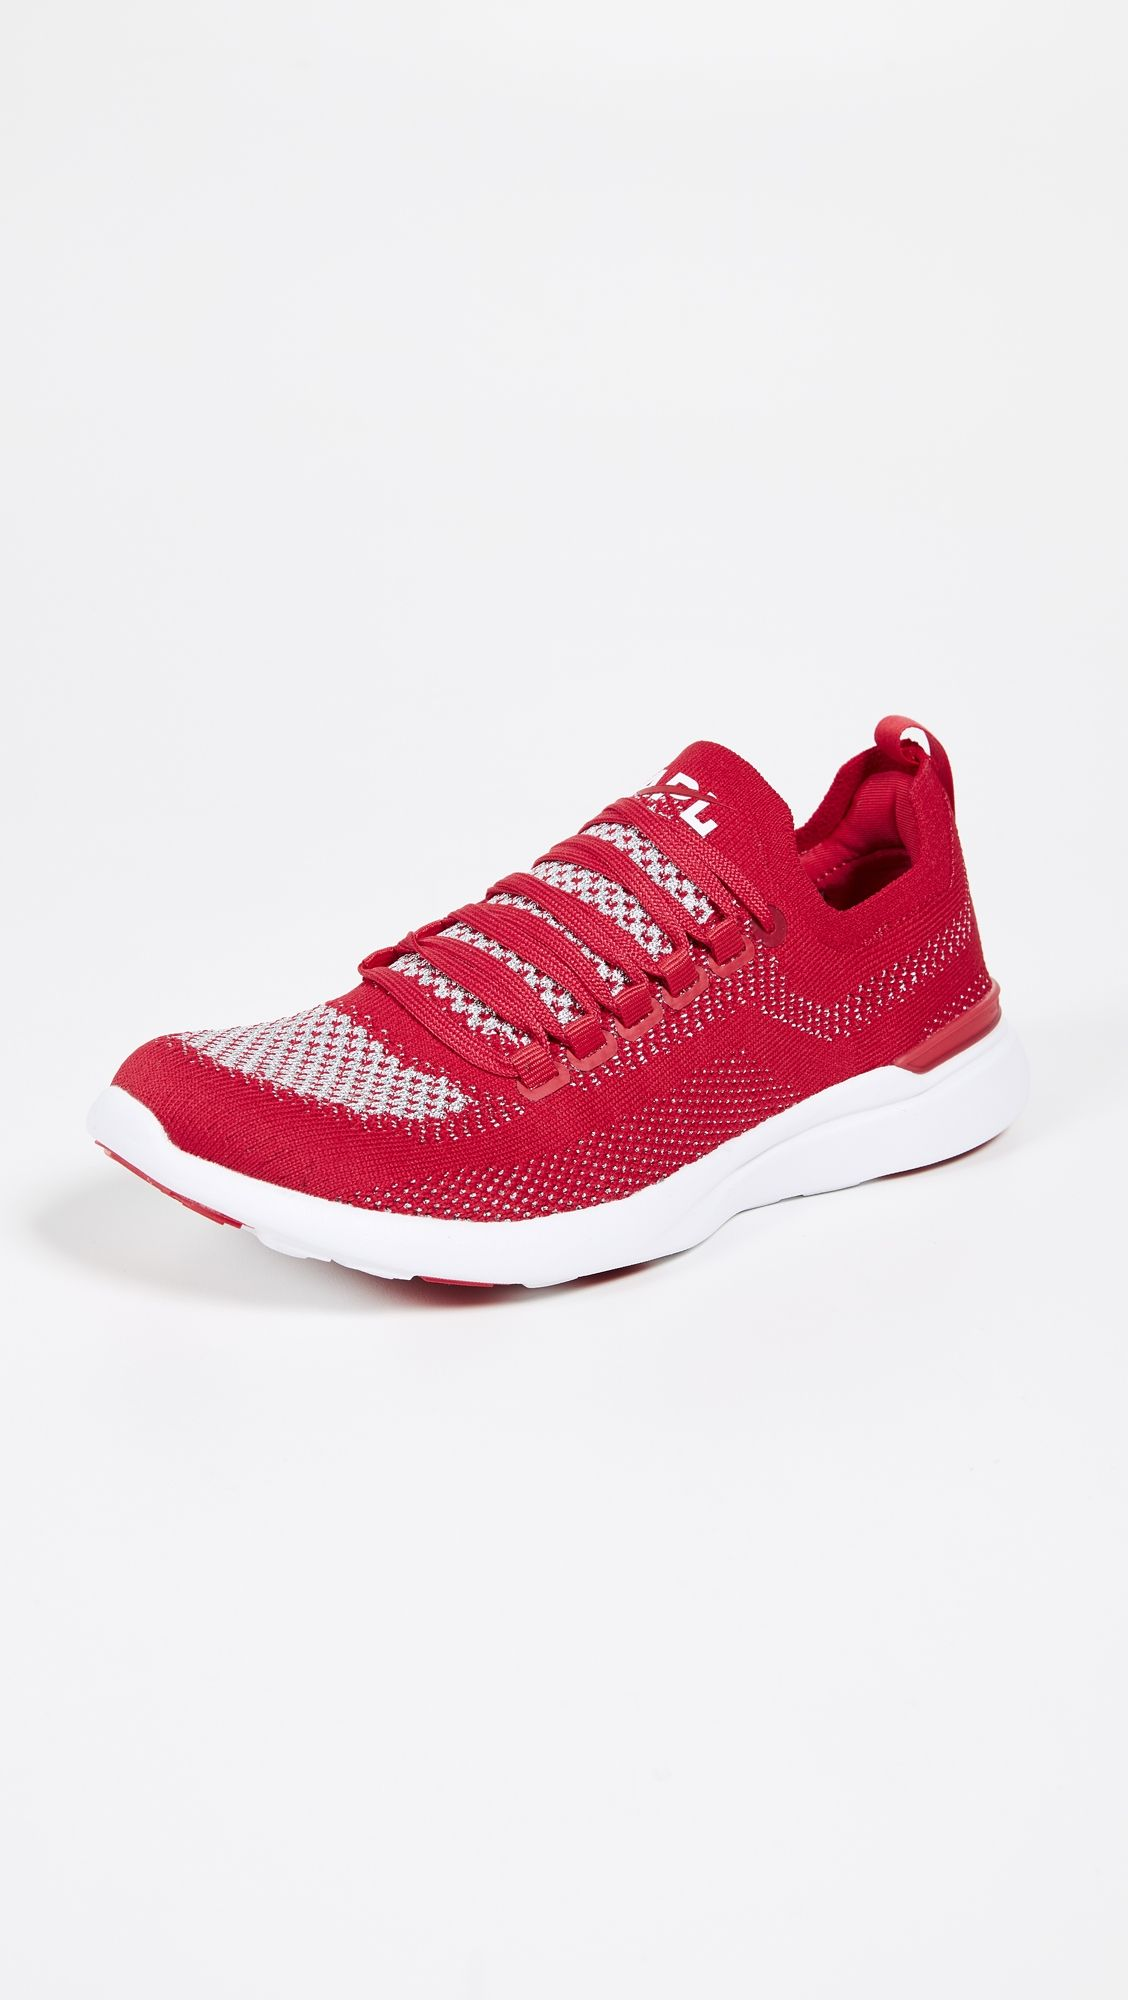 fe1b310f100f APL: Athletic Propulsion Labs TechLoom Breeze Sneakers in 2019 ...